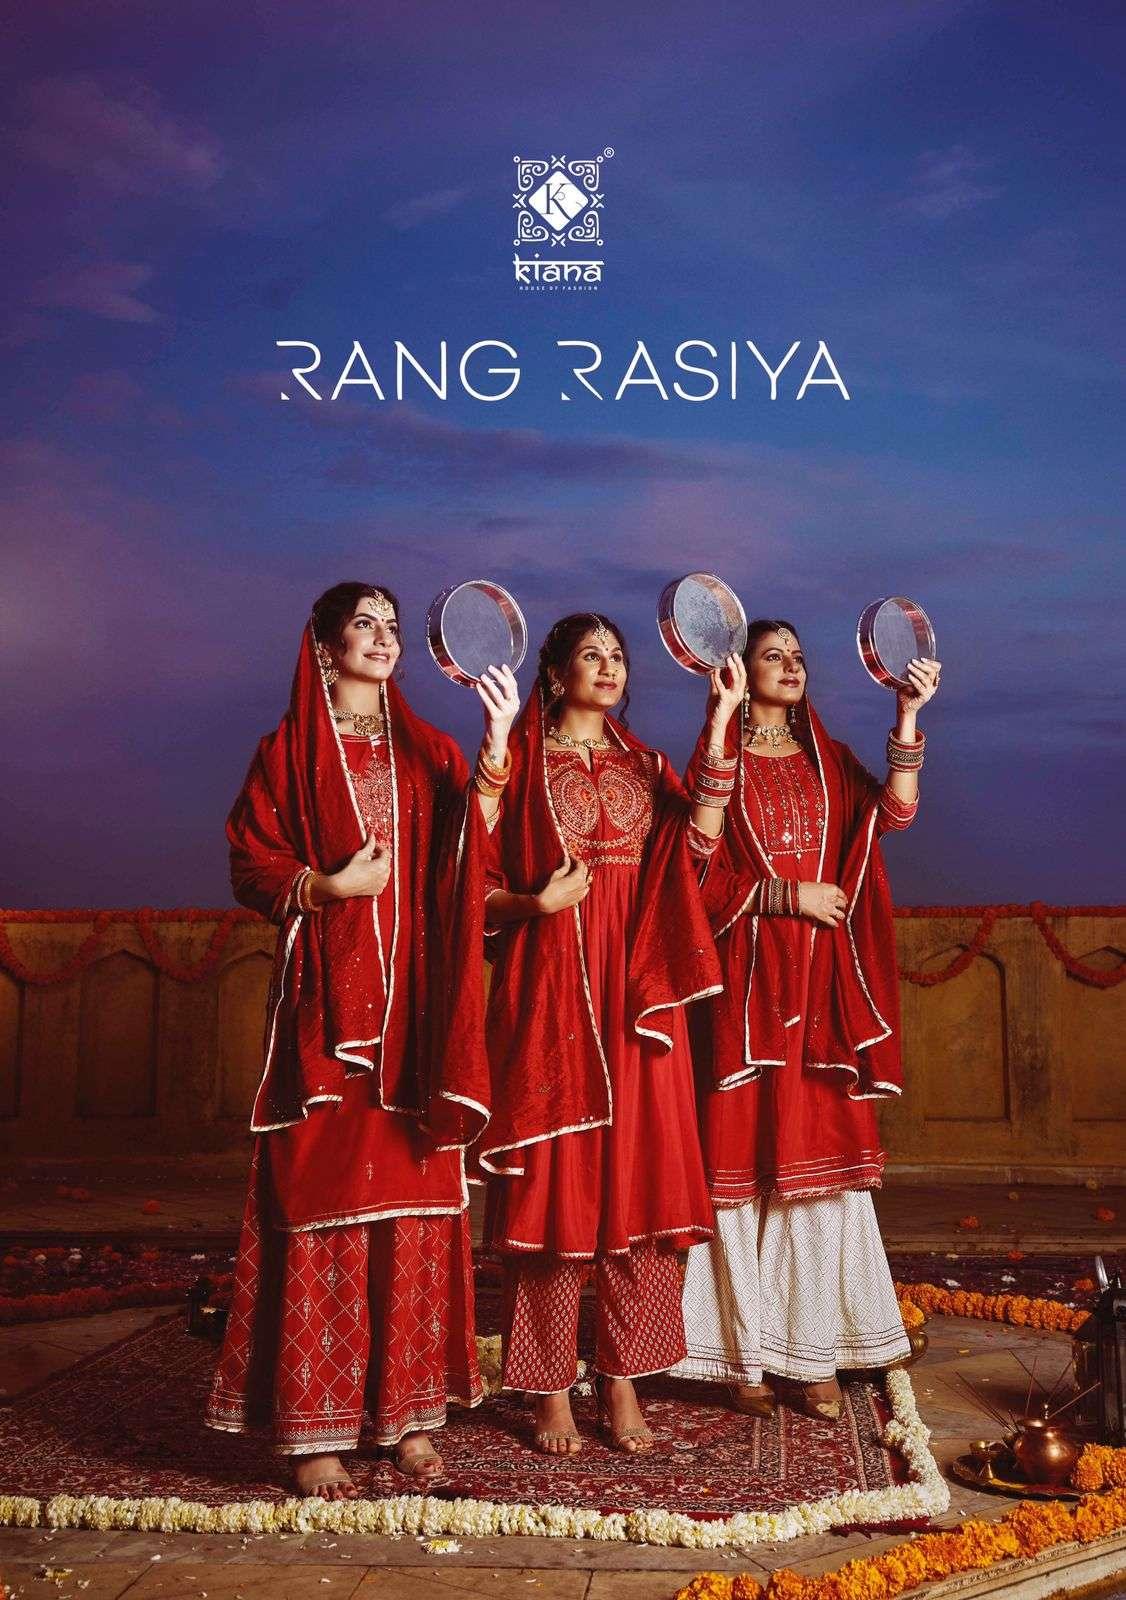 Kiana Rang Rasiya Muslin With Embroidery Work Karva chauth Collection